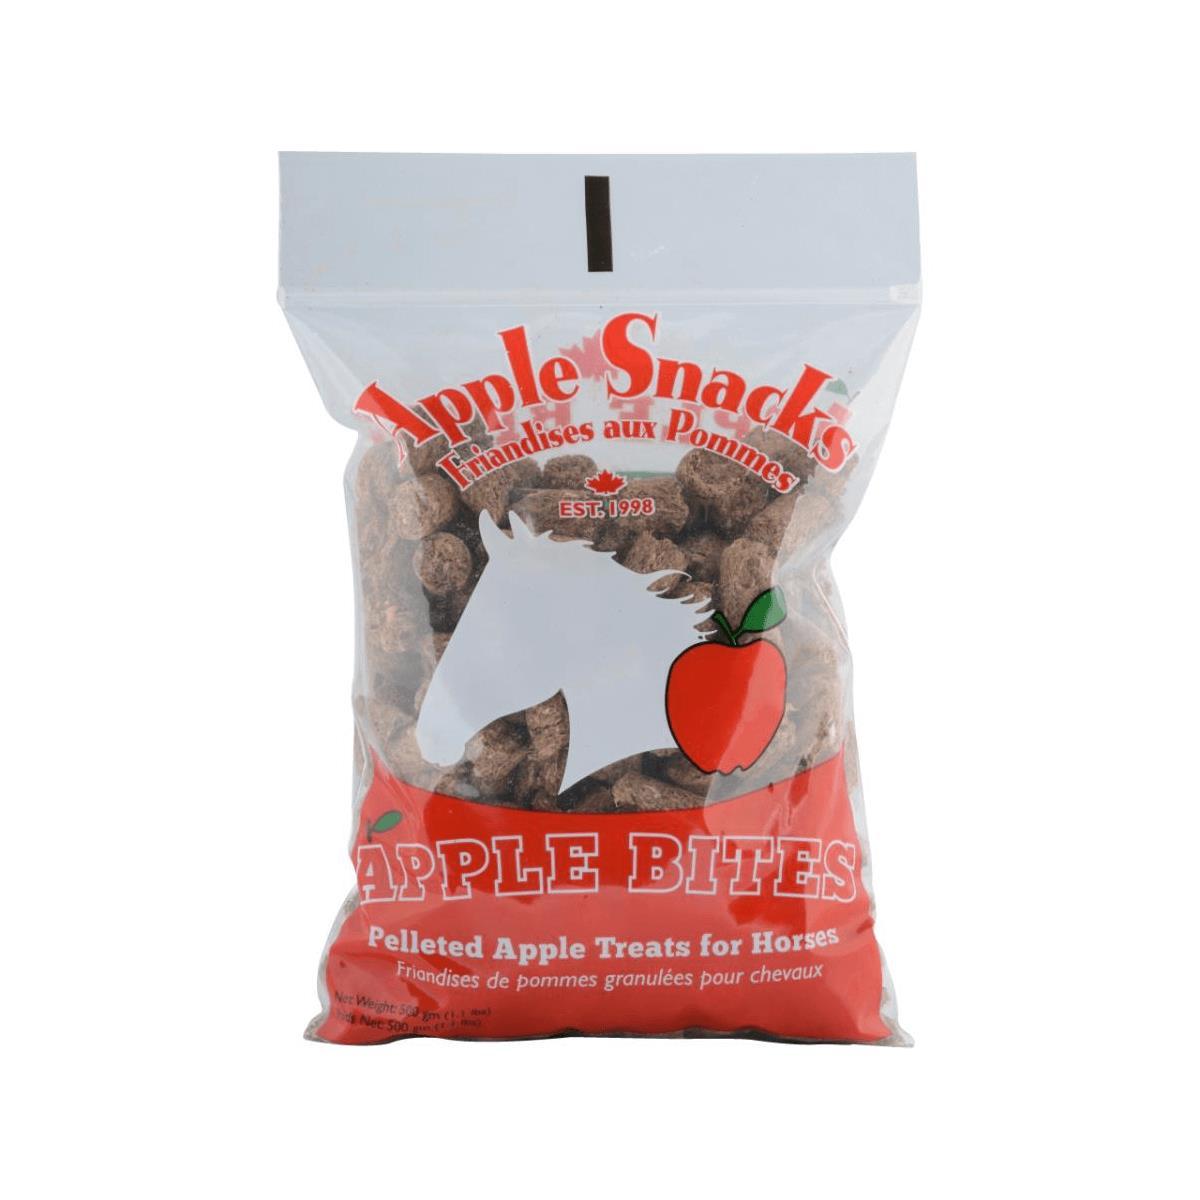 Apple Bites Horse Treats - 500g